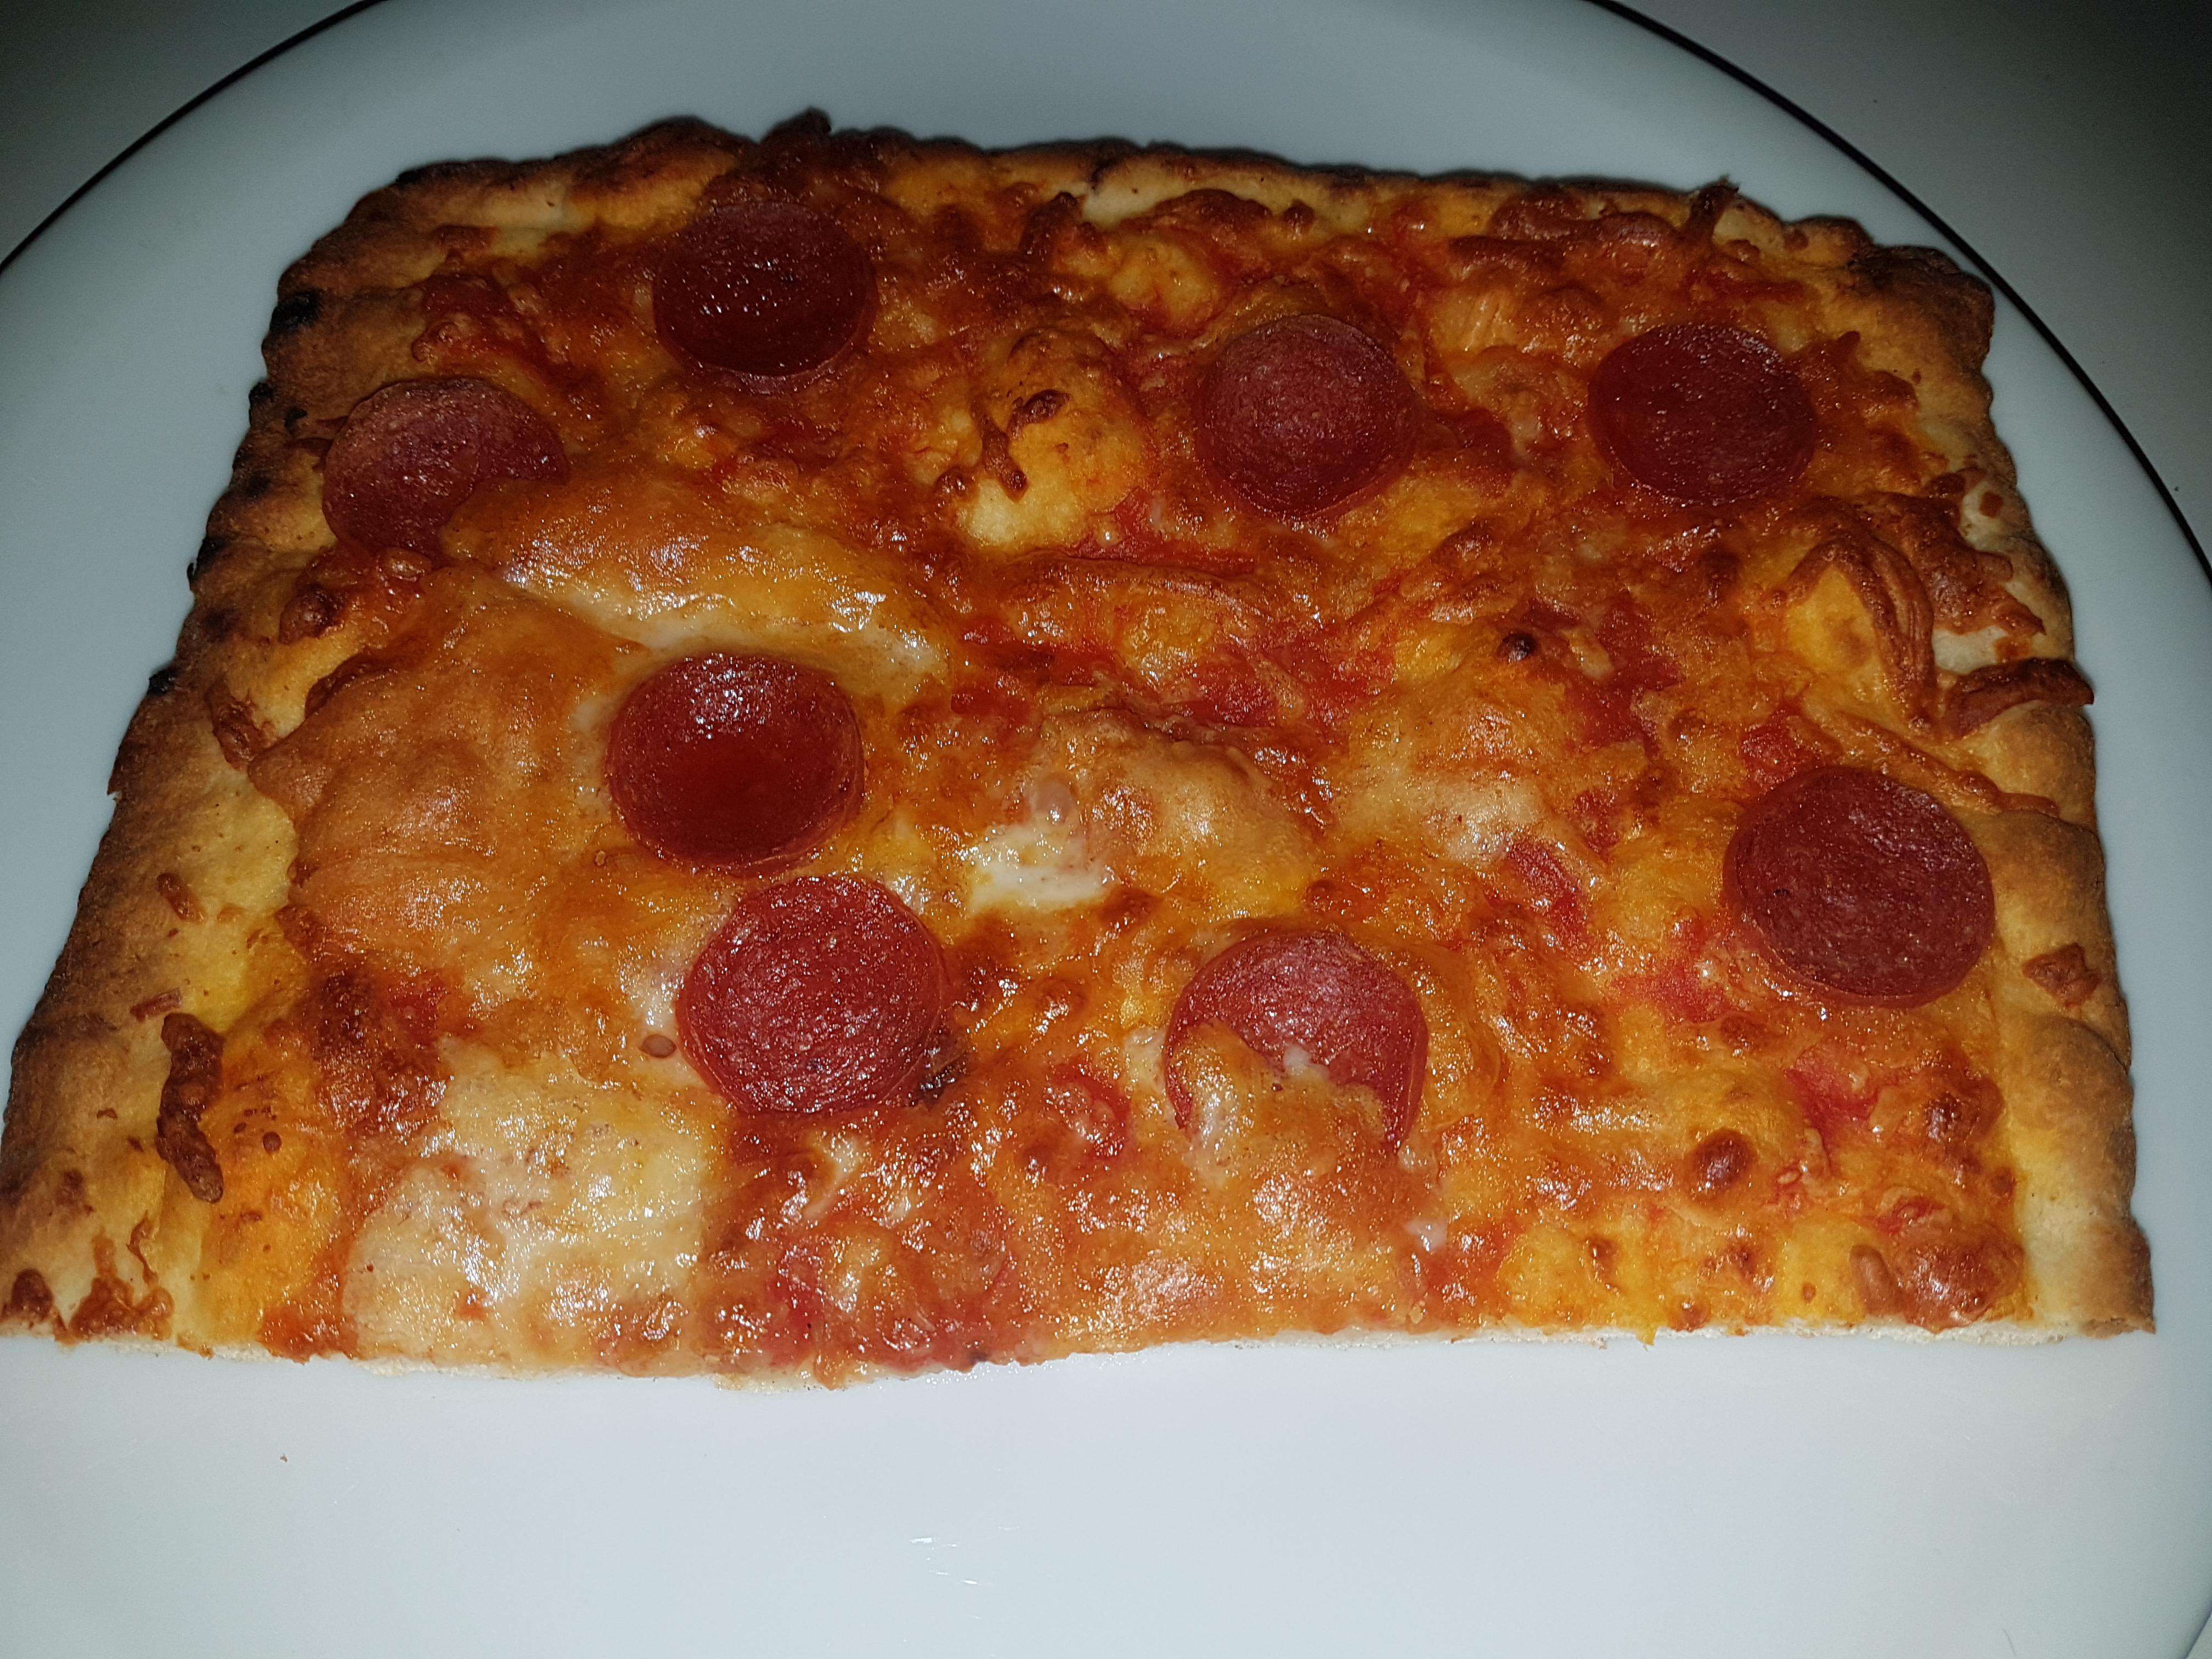 http://foodloader.net/Holz_2018-08-06_Pizza_2.jpg